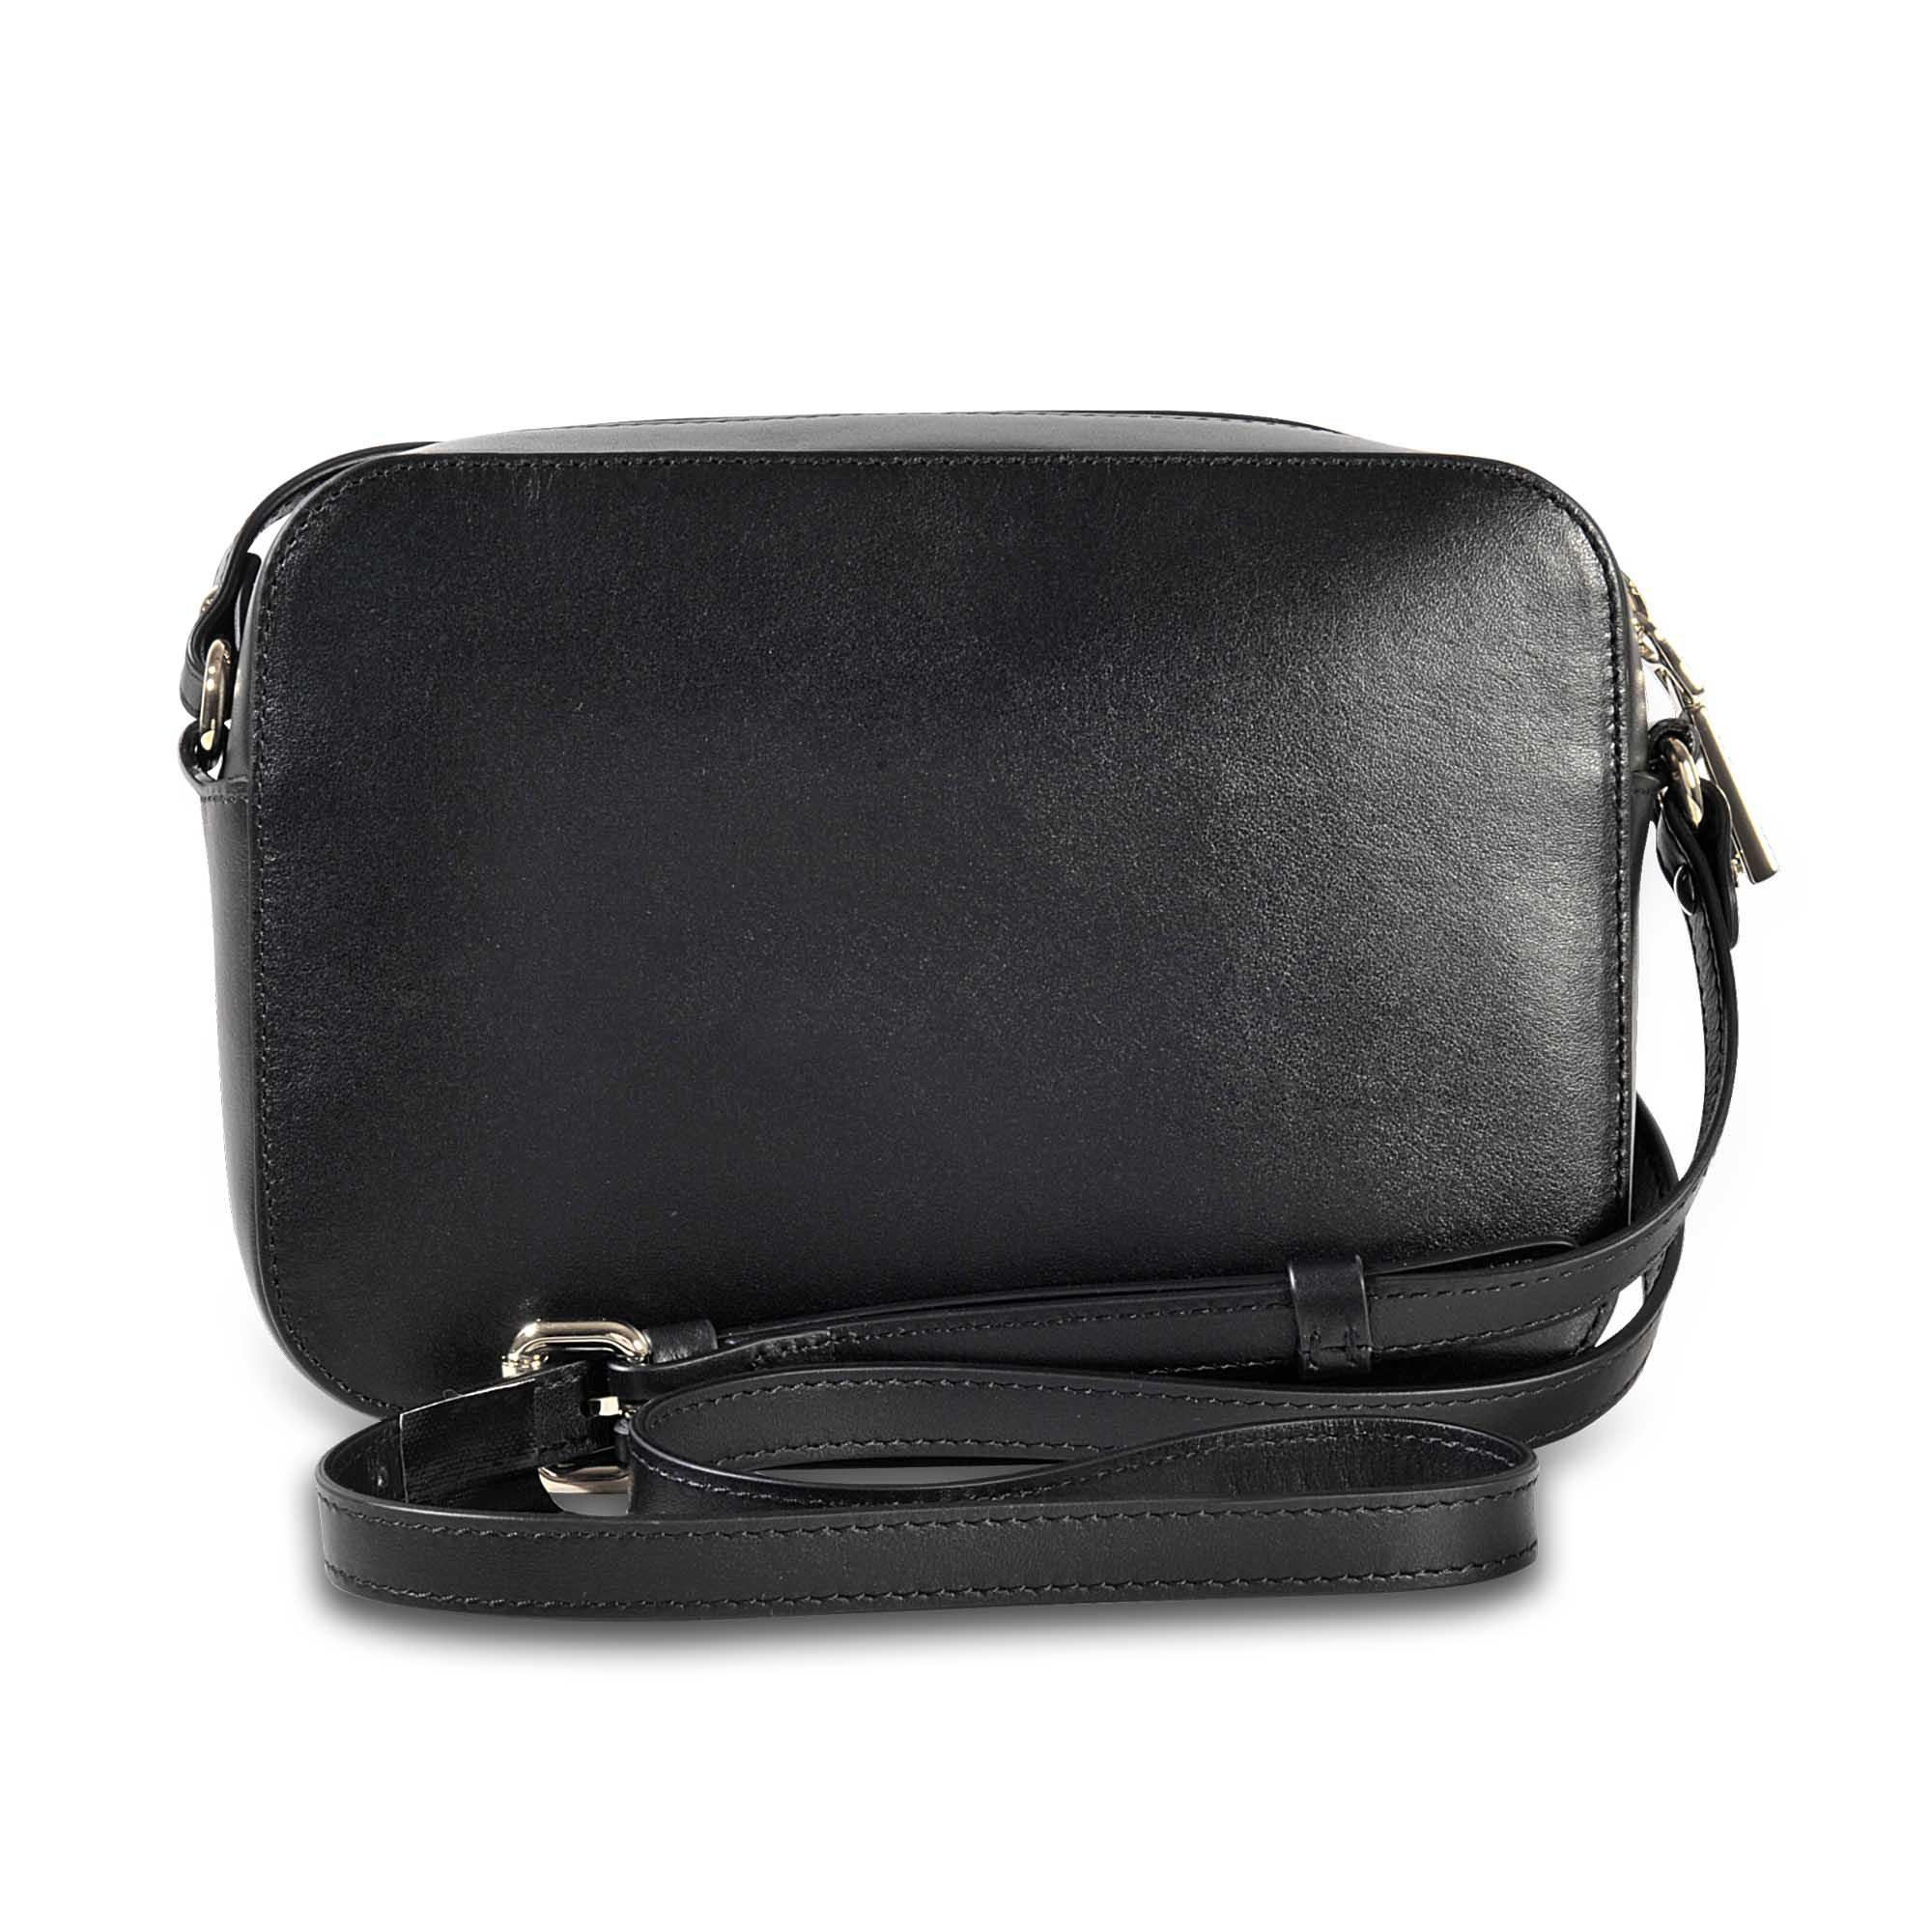 640c50c65cb1 Versace Palazzo Camera Bag in Black - Lyst